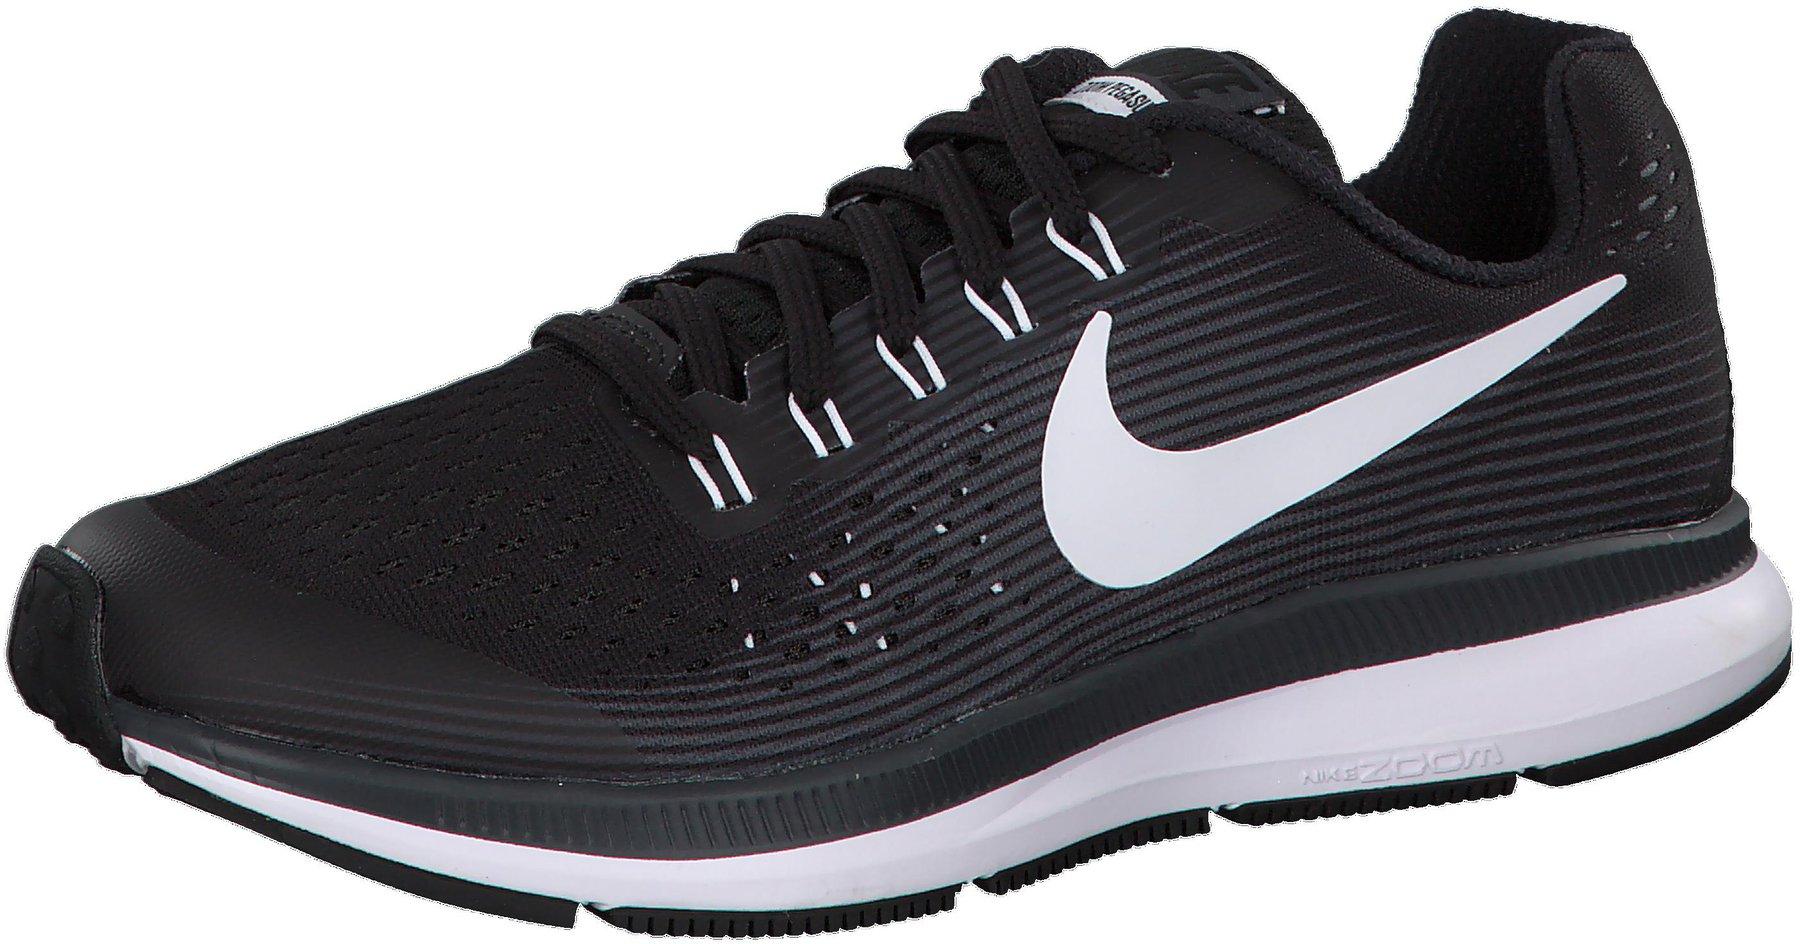 490e554615fa93 Nike Zoom Pegasus 34 Jr ab 49 € im Preisvergleich kaufen